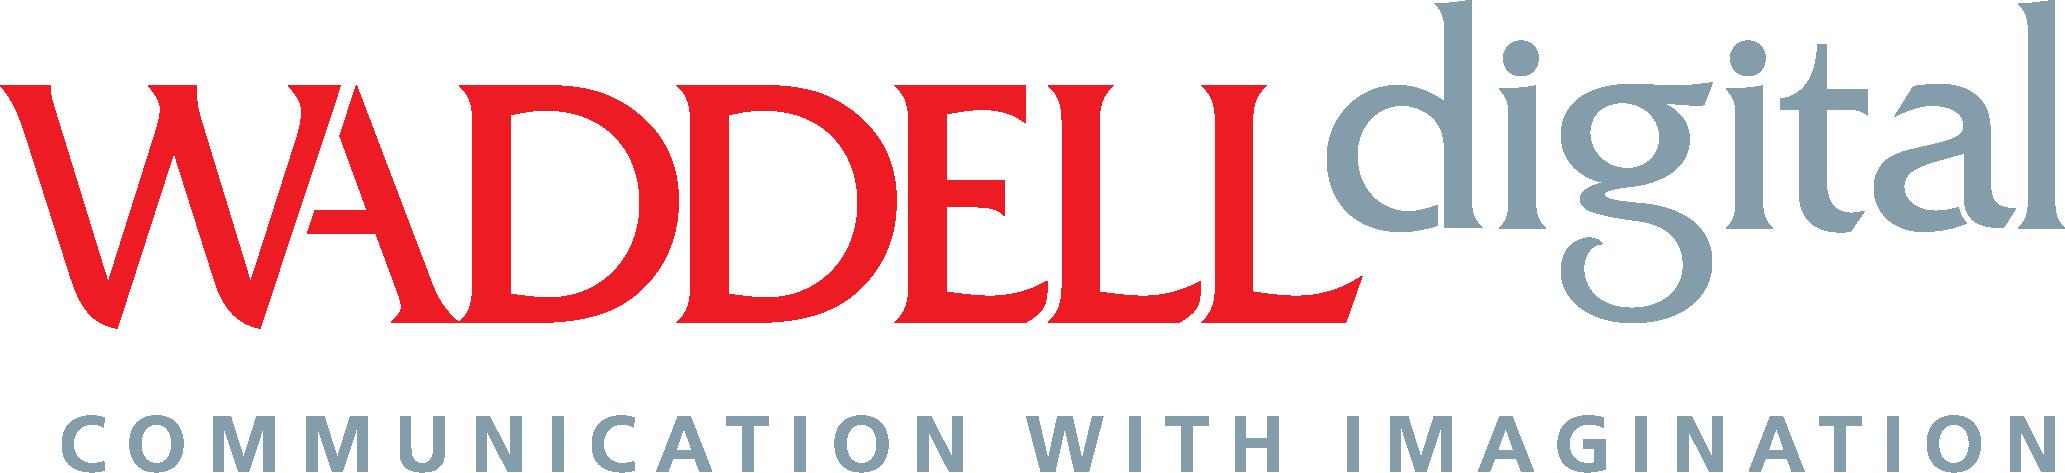 Waddell Digital